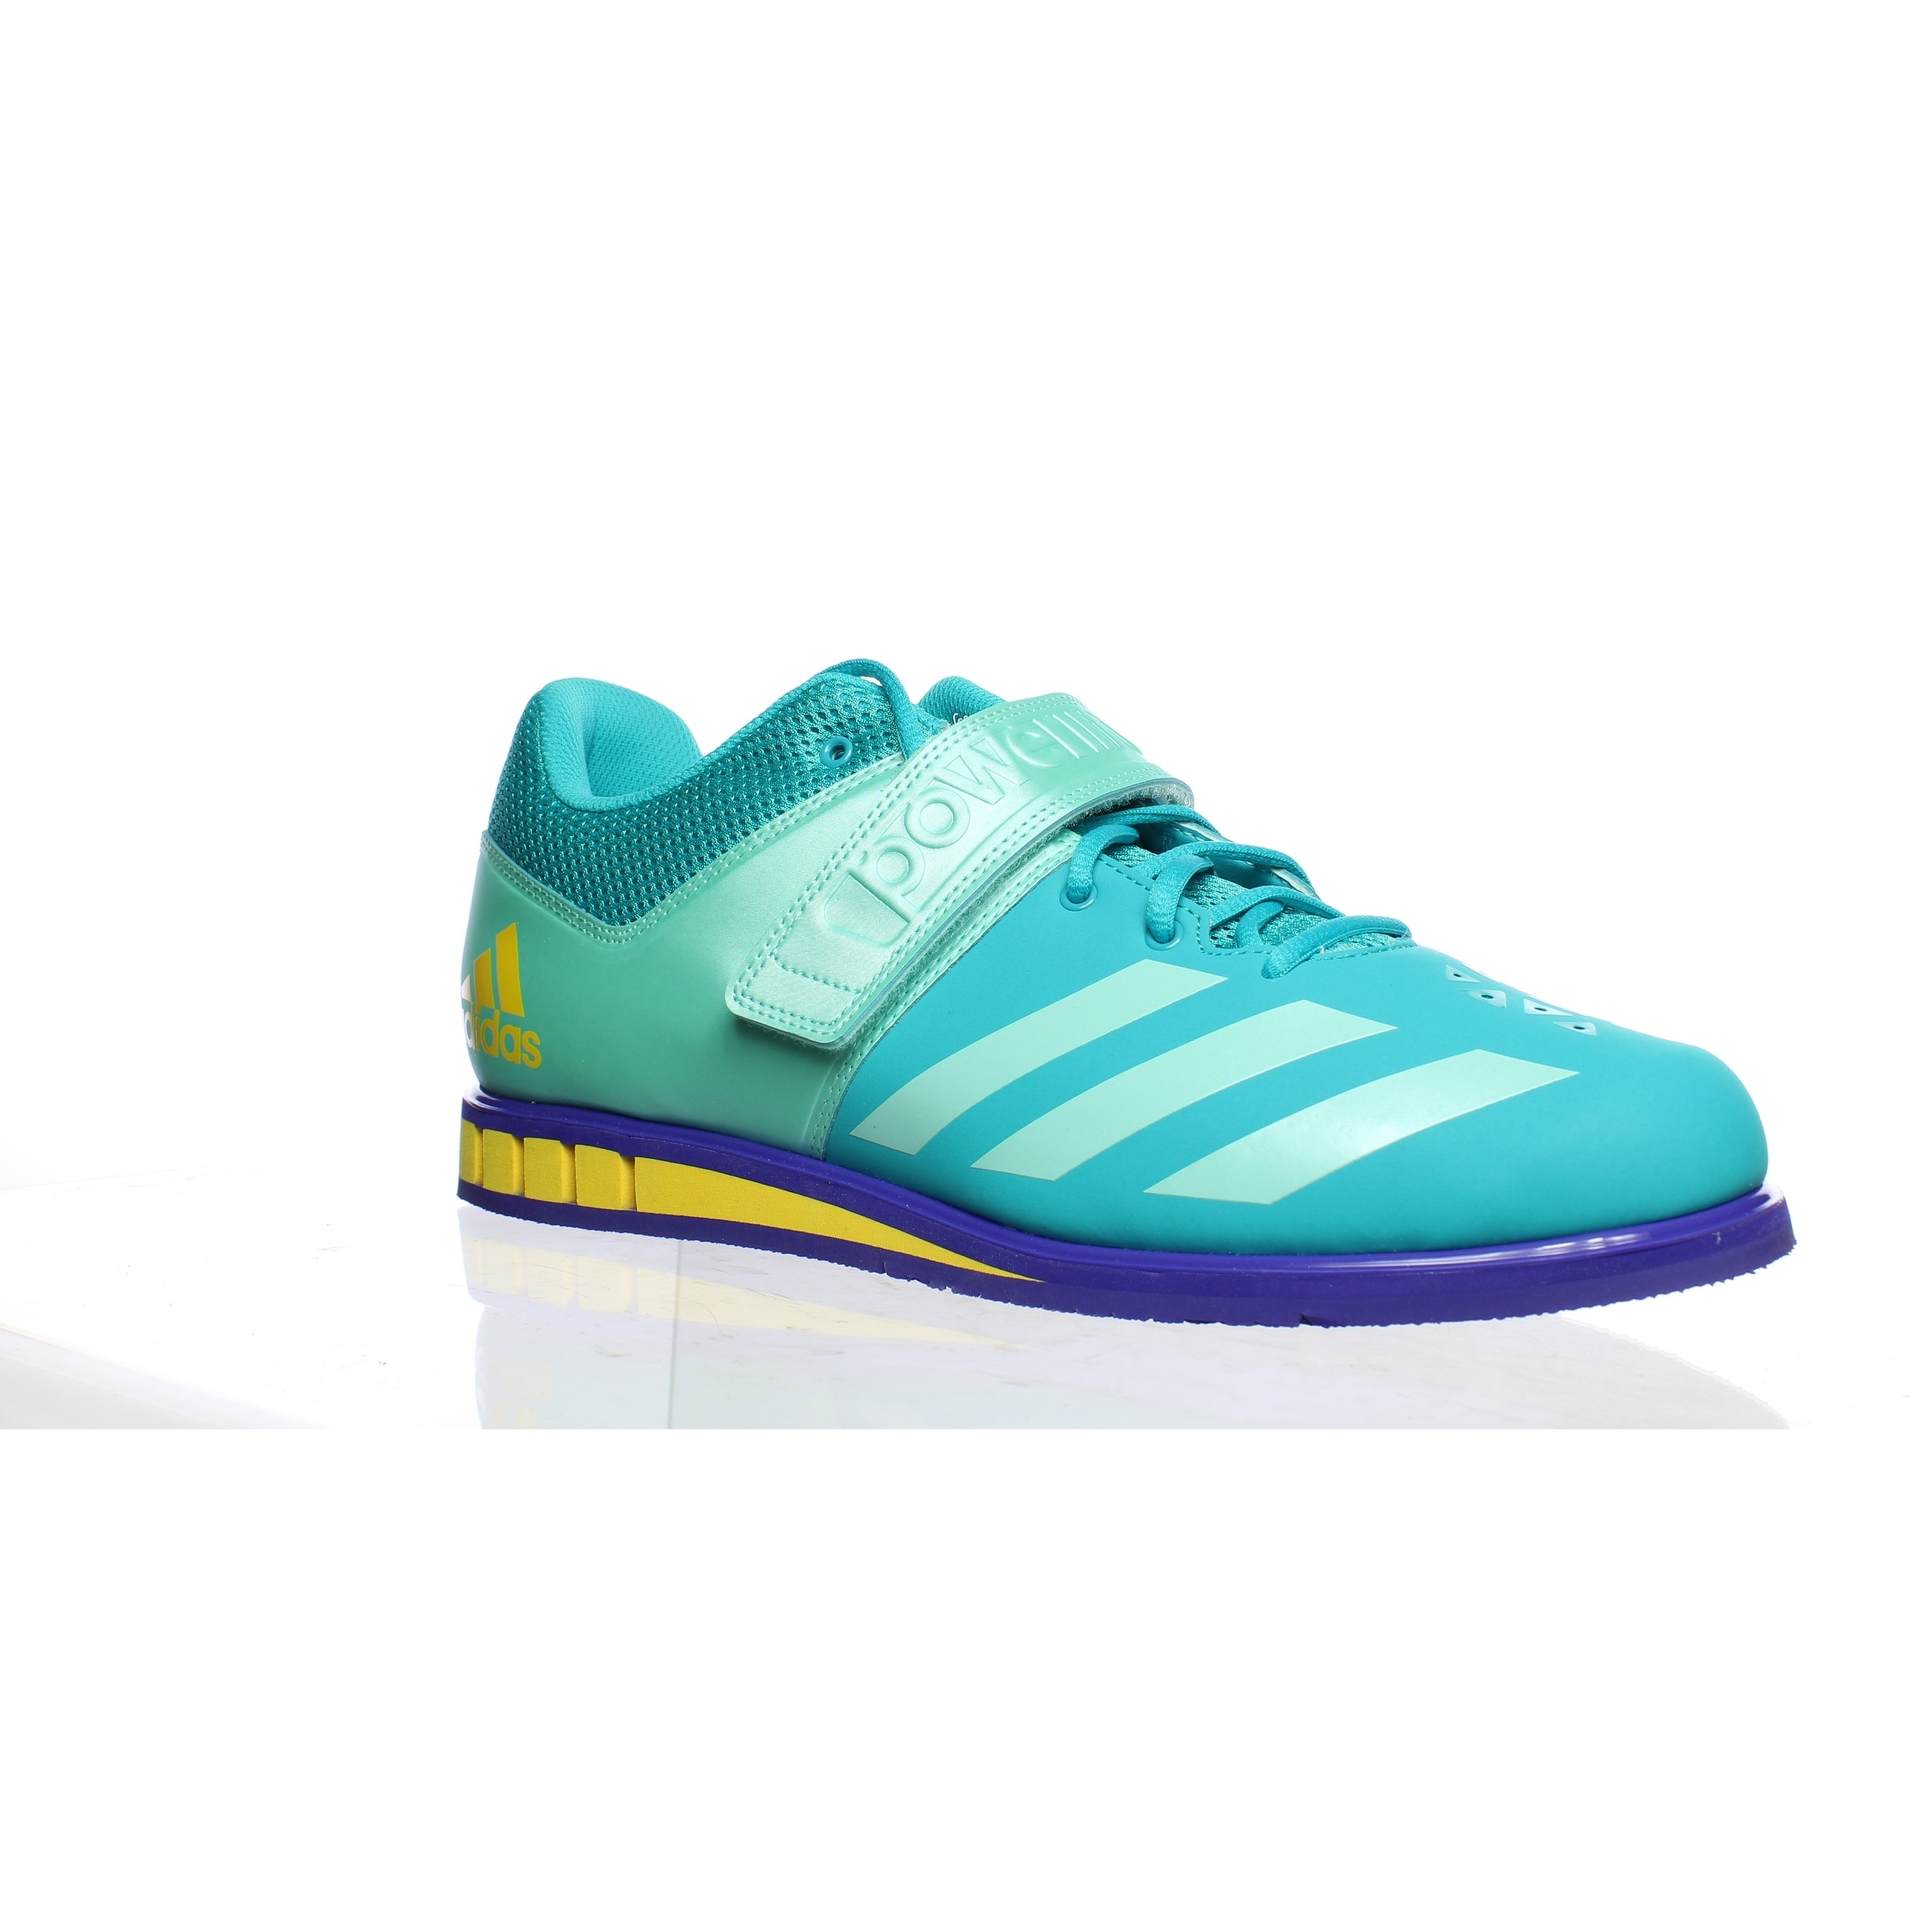 Shop Adidas Womens Powerlift 3.1 Teal